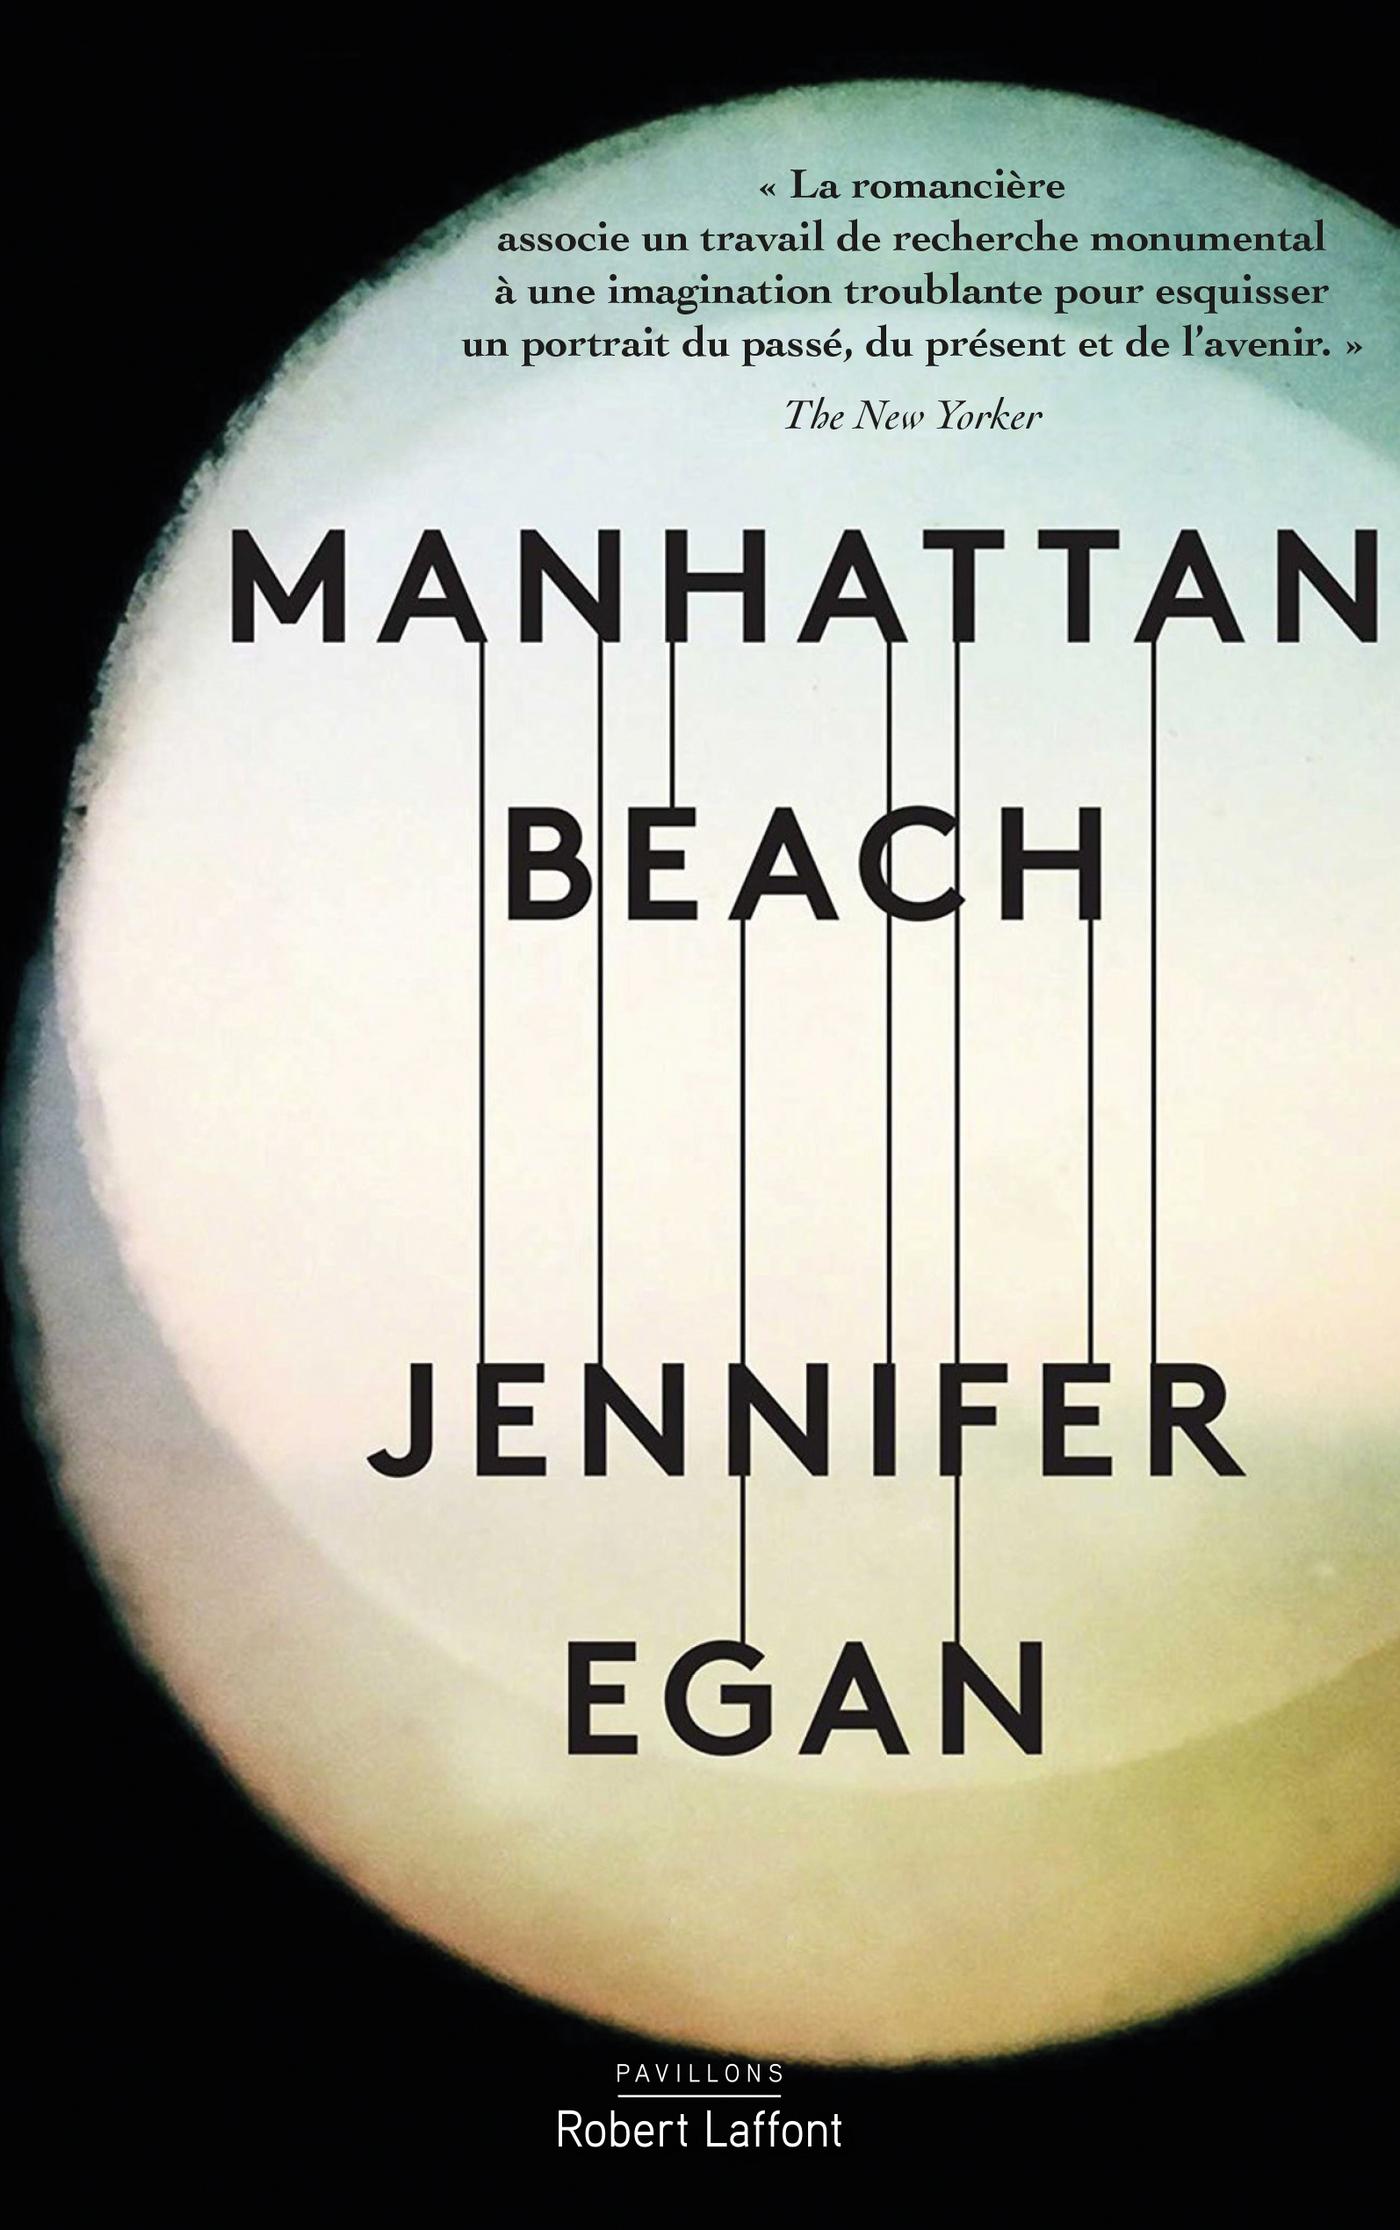 Manhattan Beach - Édition française | EGAN, Jennifer